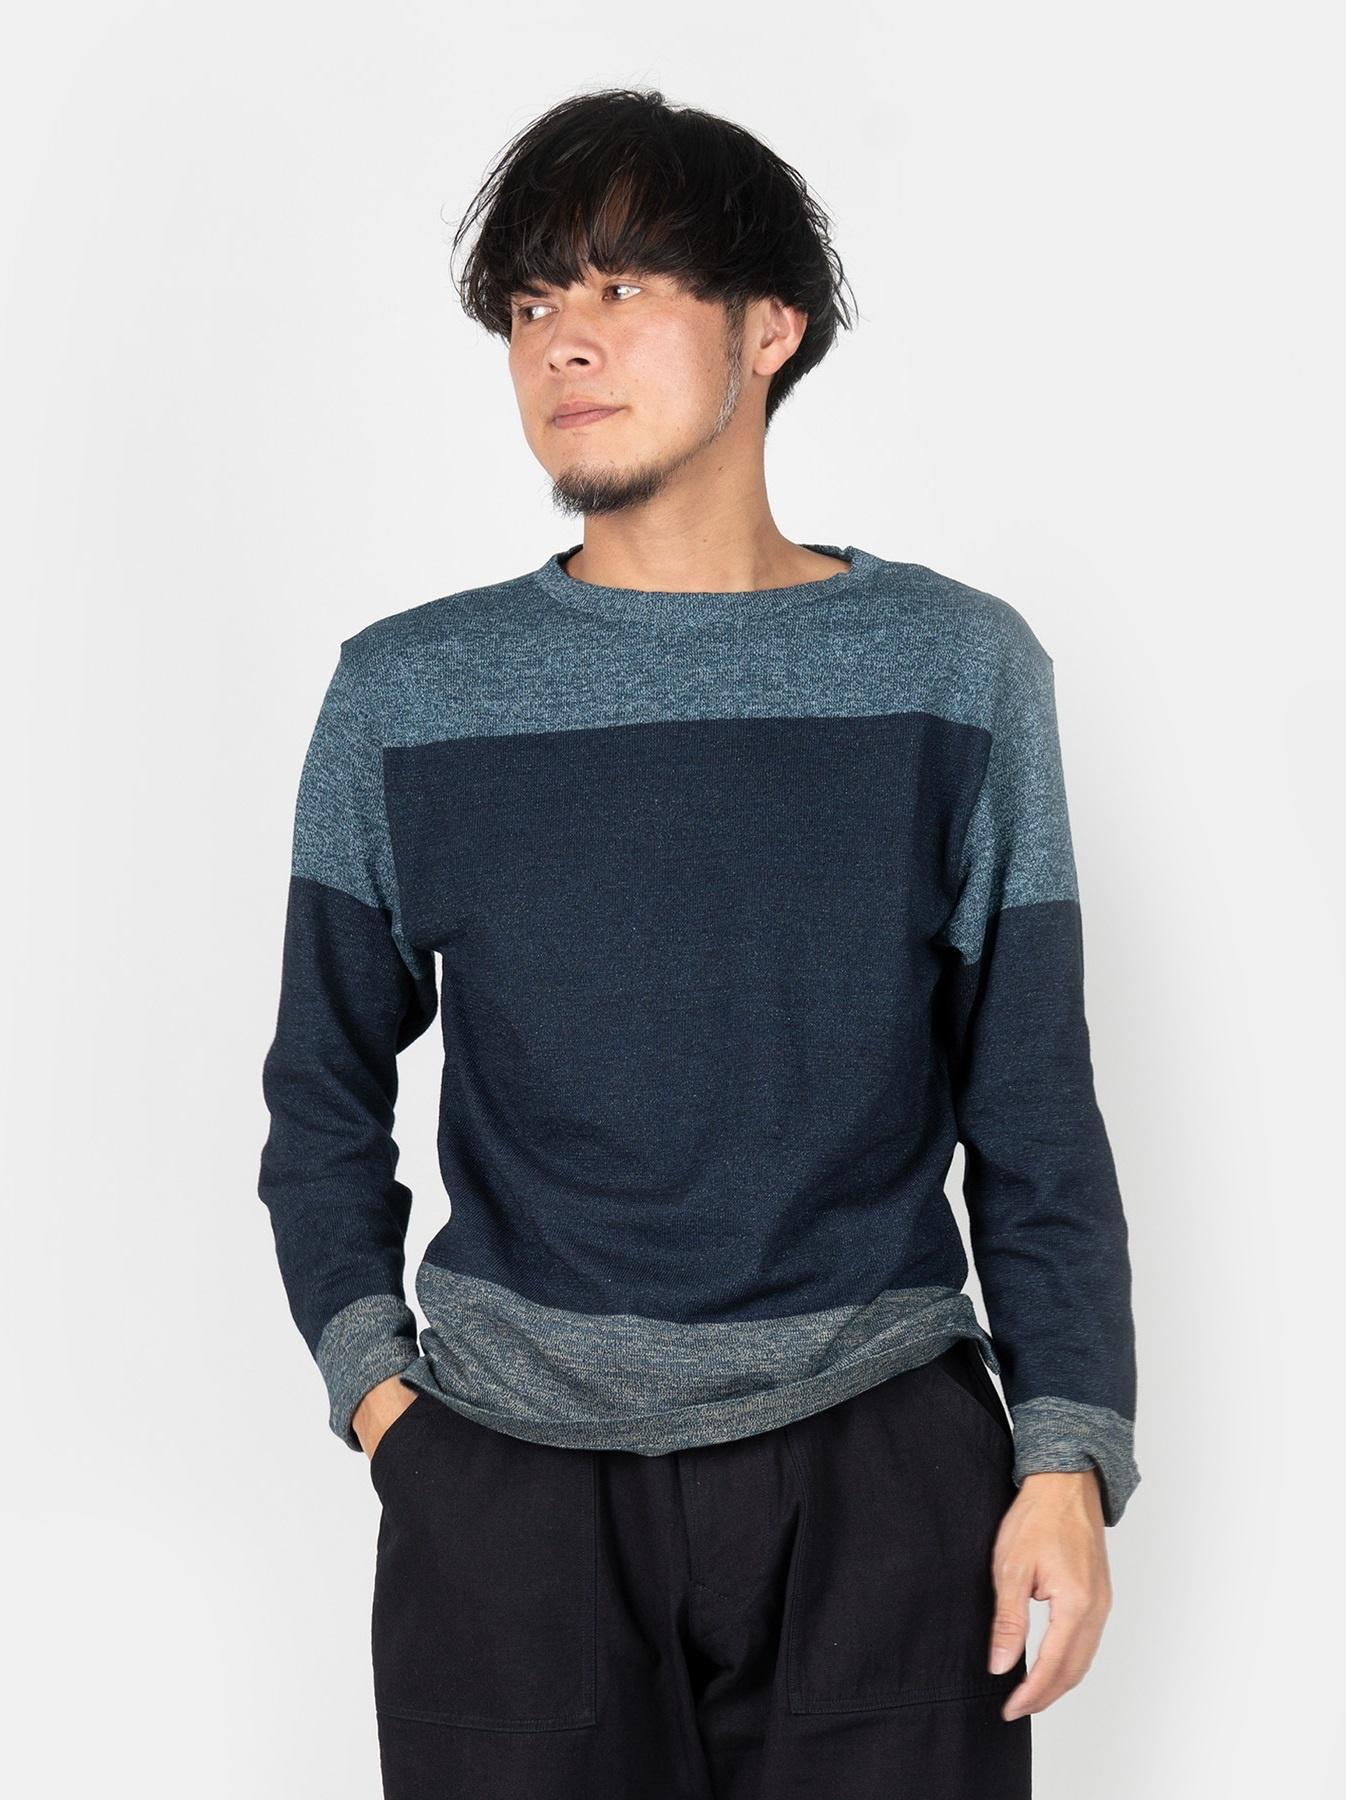 WH Gauze Basque Knit T-shirt-3